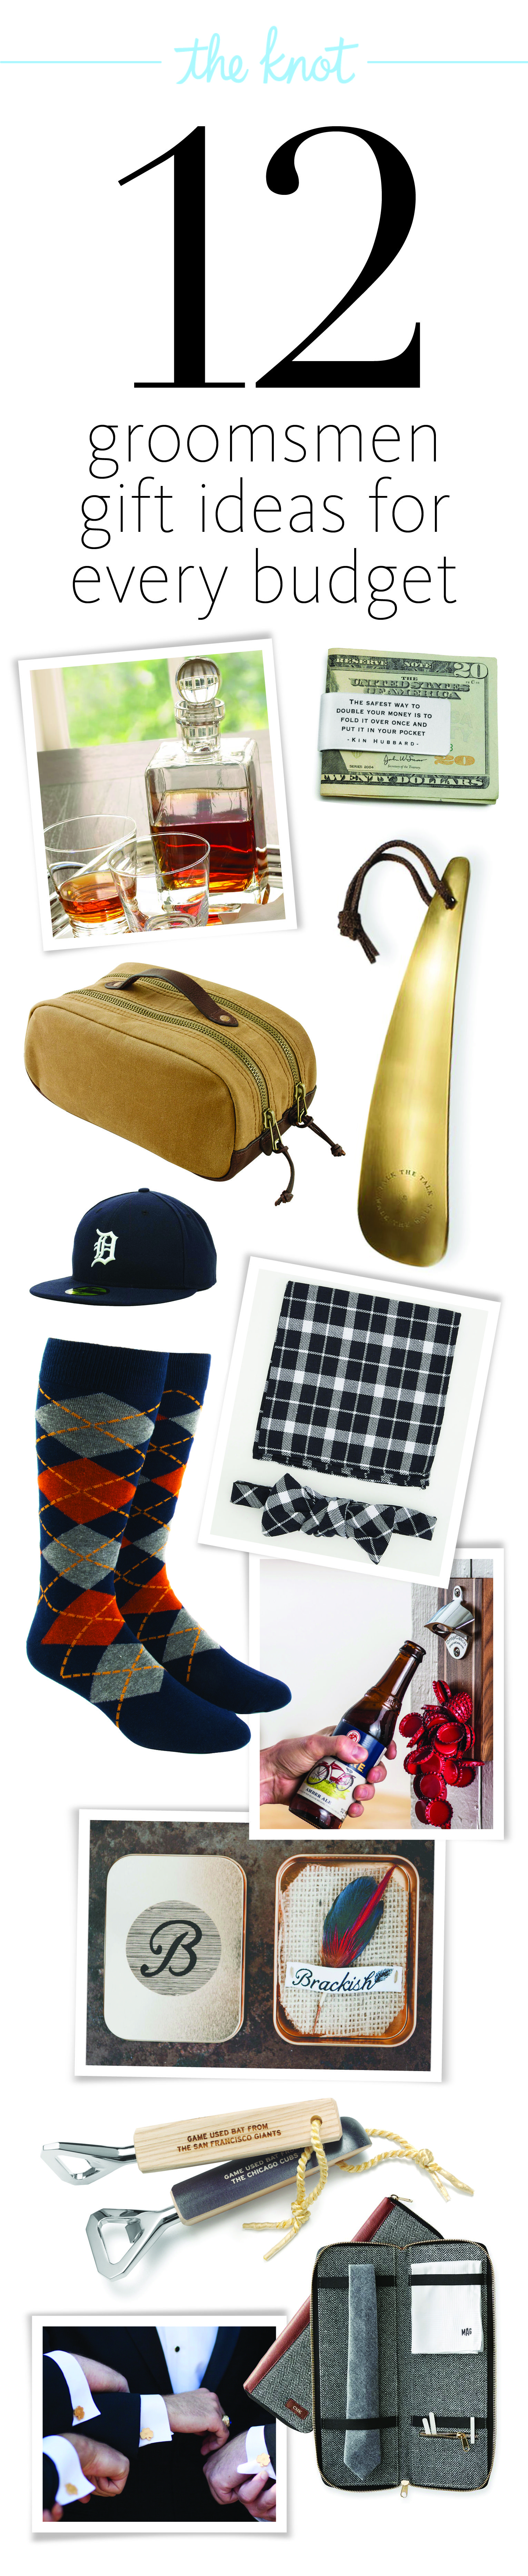 Best Groomsmen Gift Ideas for Every Budget!   Groom & Groomsmen ...